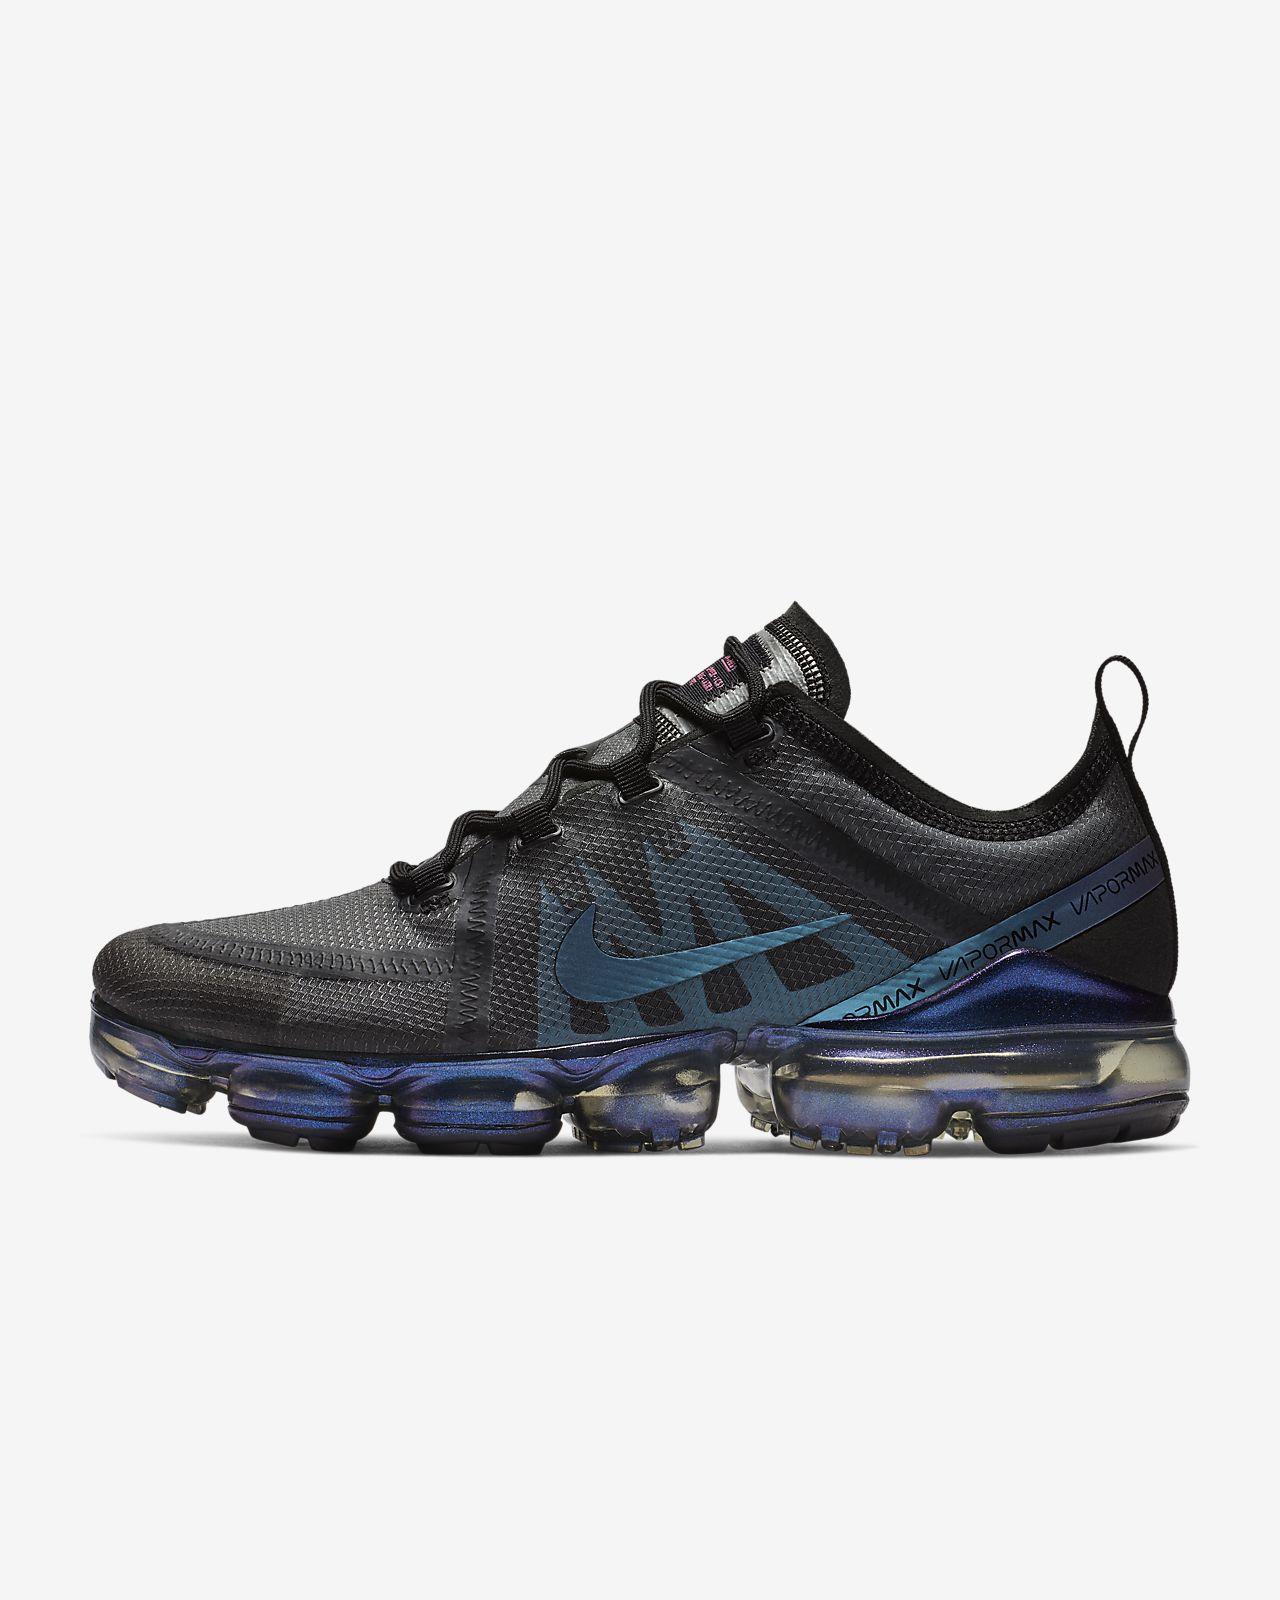 5a57474208ee Nike Air VaporMax 2019 Shoe. Nike.com